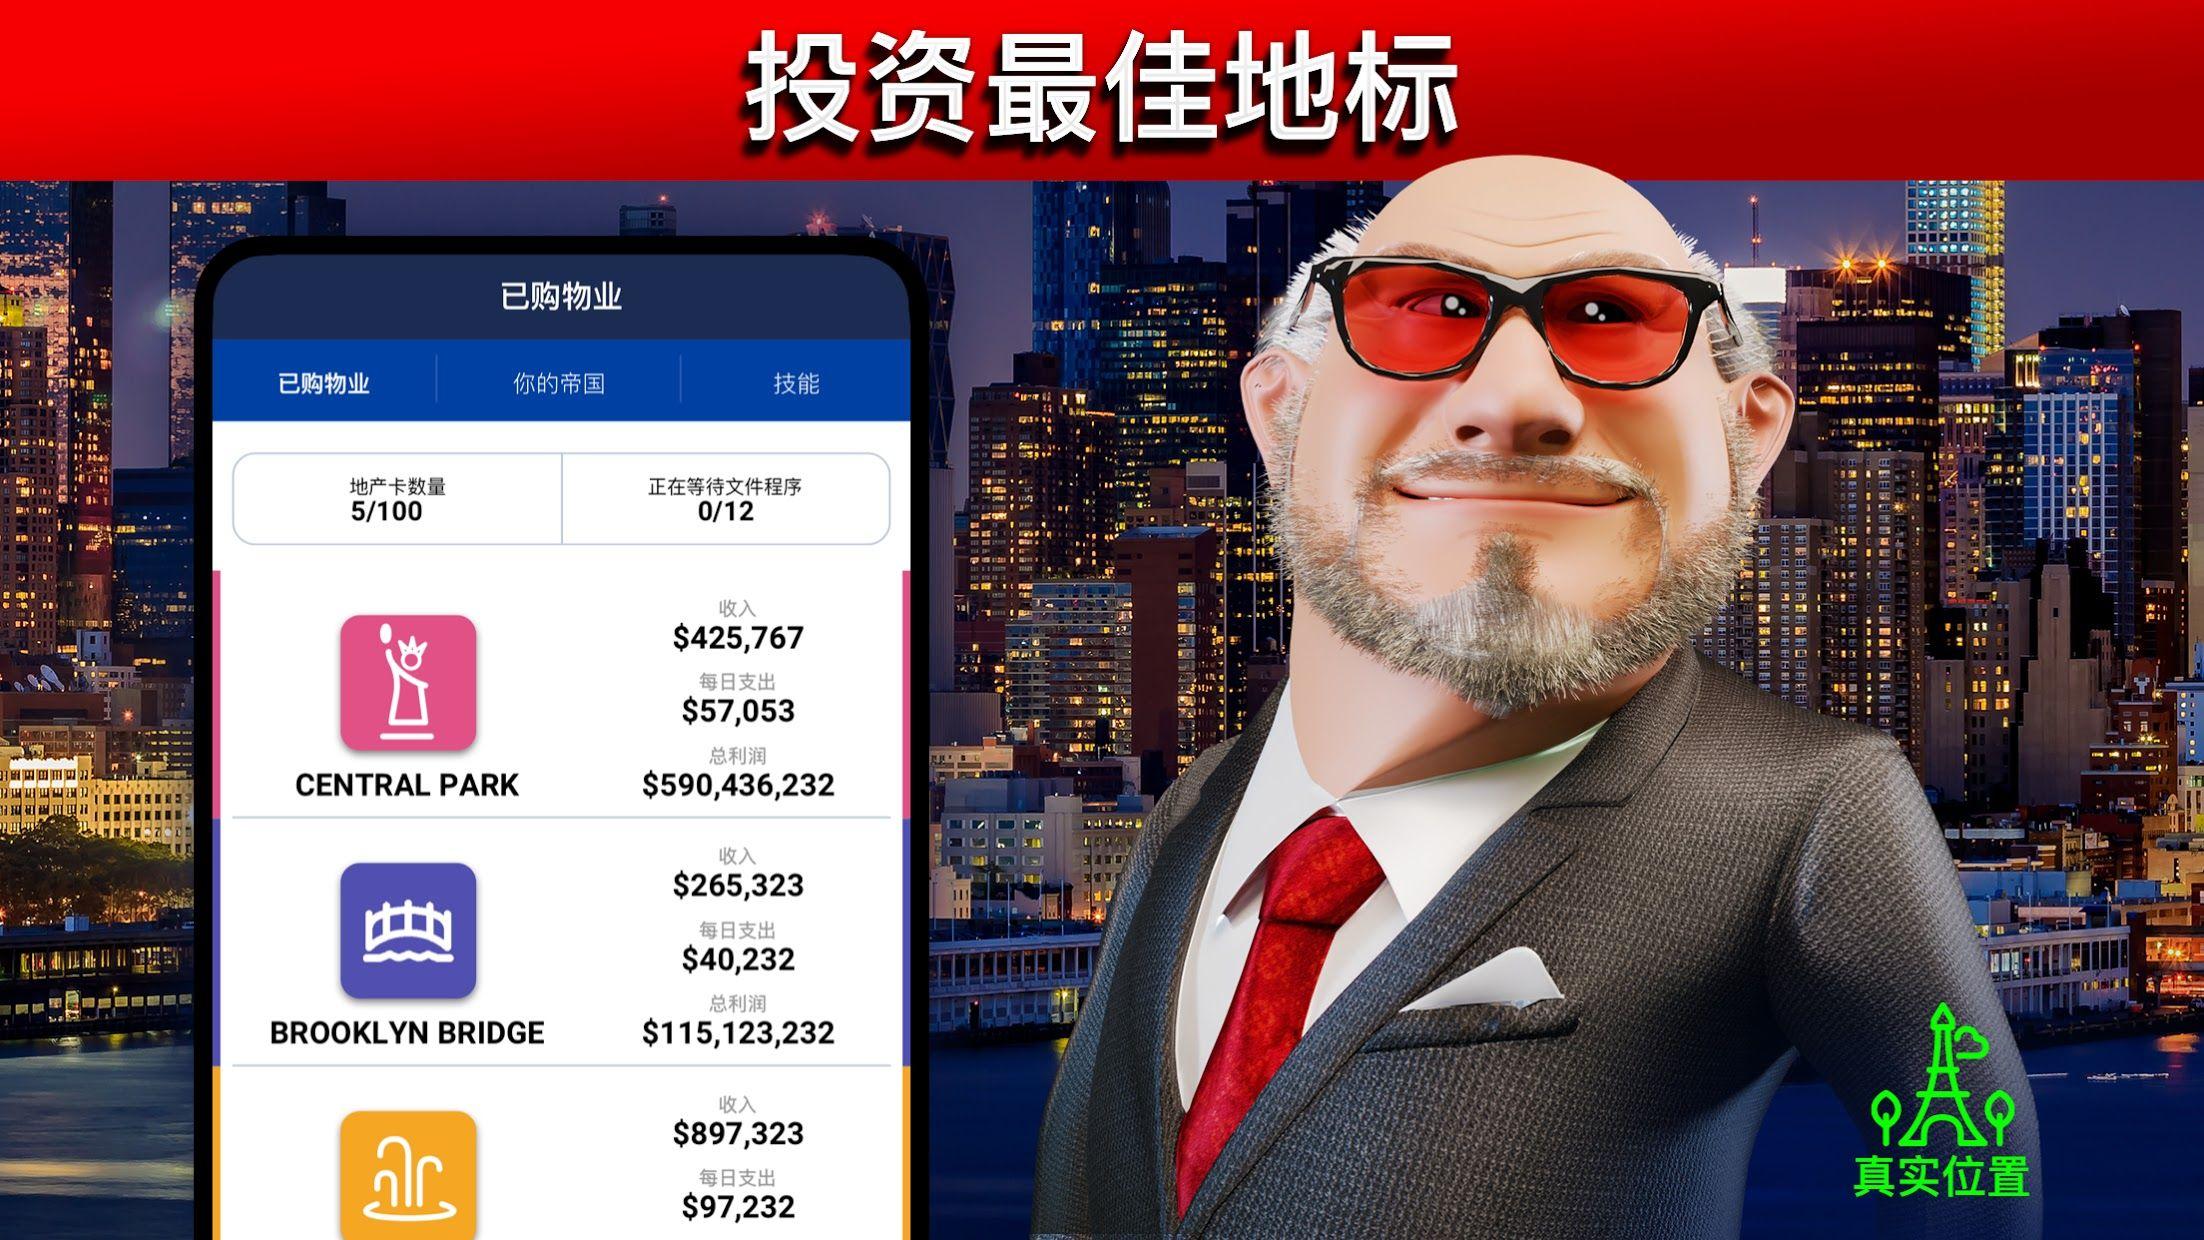 Landlord Tycoon - 探索真实世界城市房地产投资交易模拟经营游戏成为地产富豪 游戏截图2